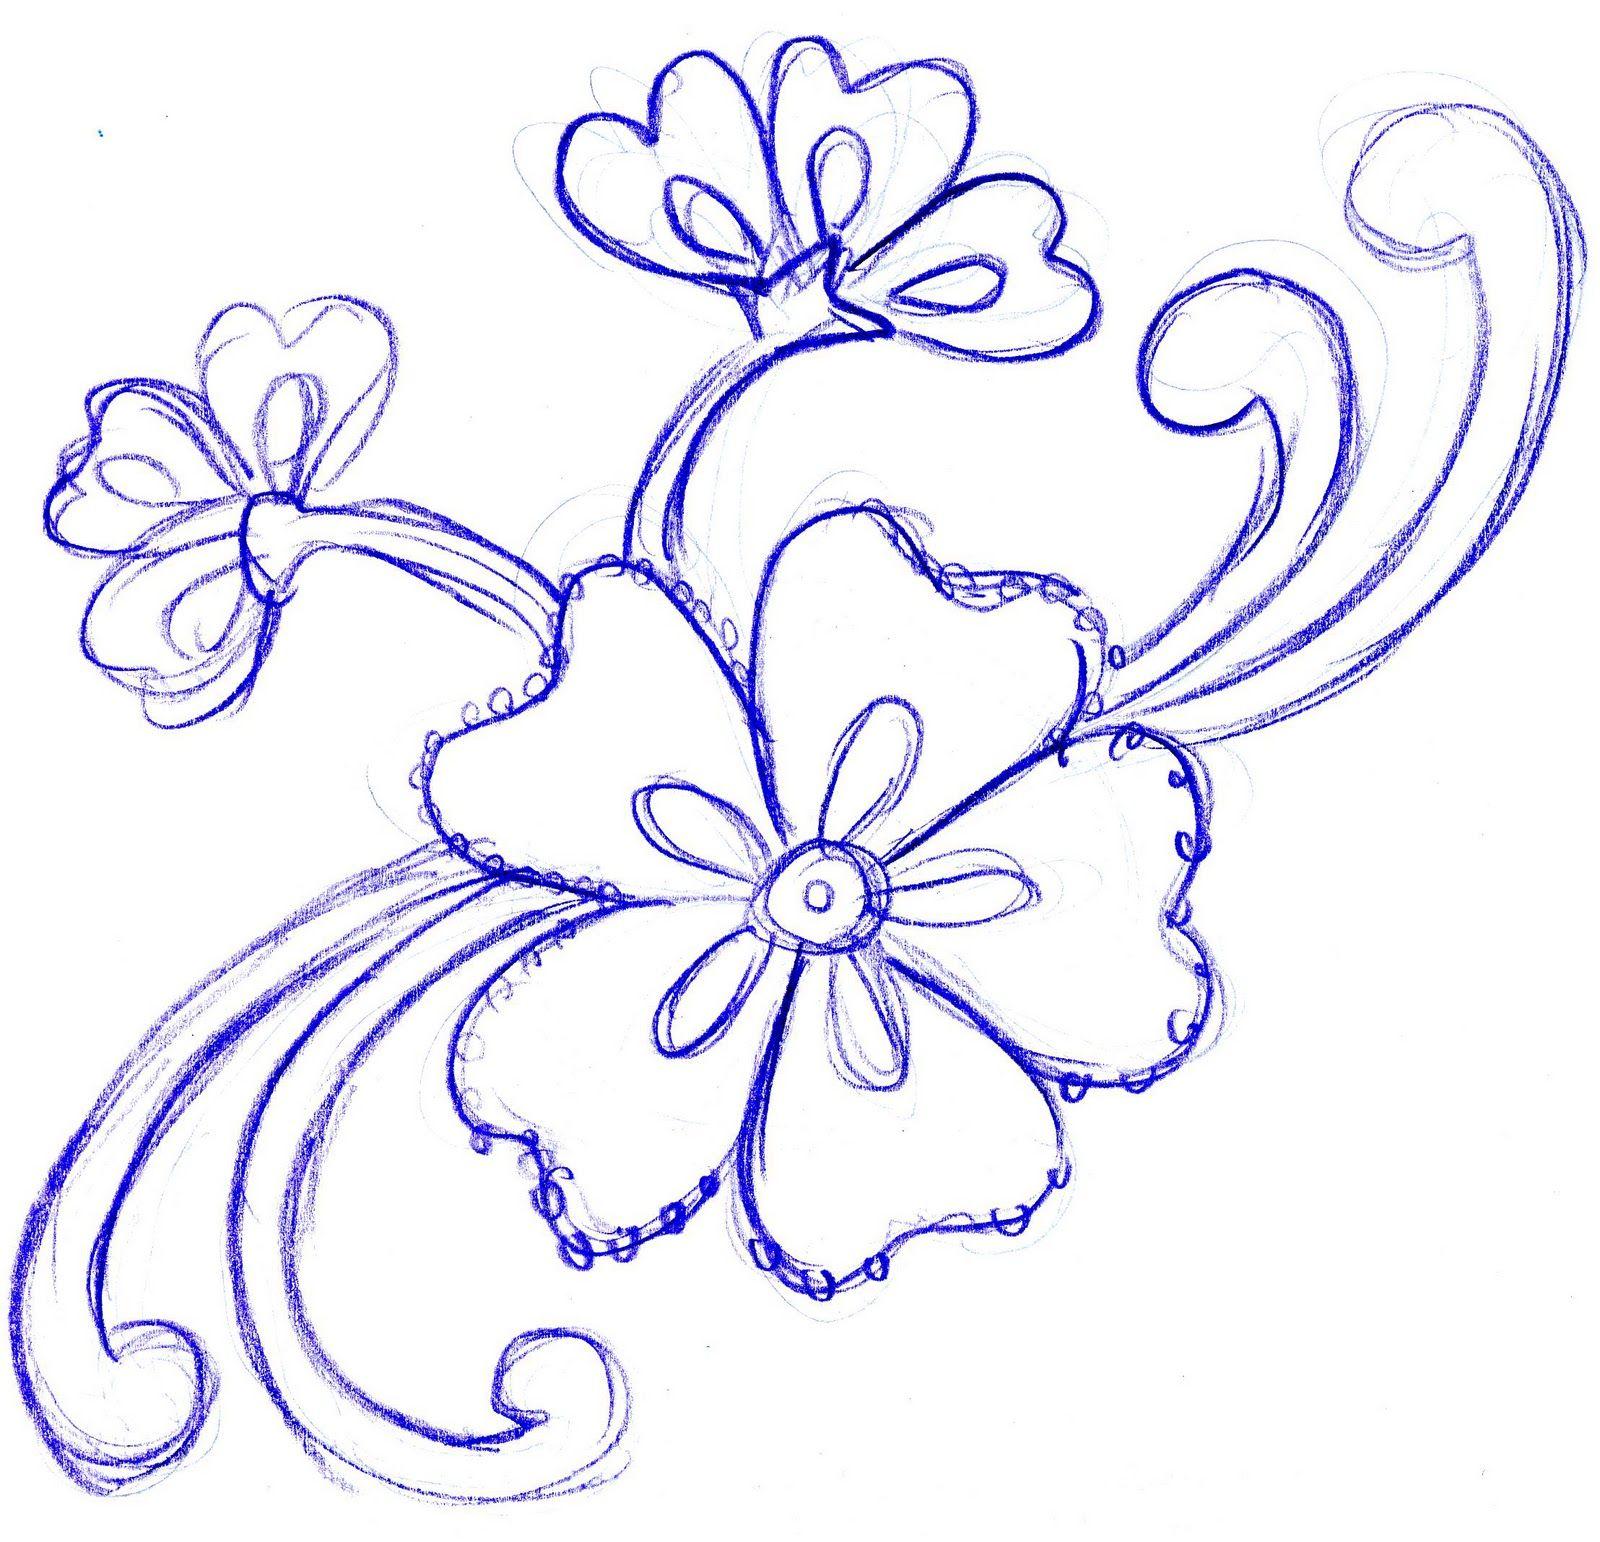 Sketches Of Flowers Corinne Okada Design Concept